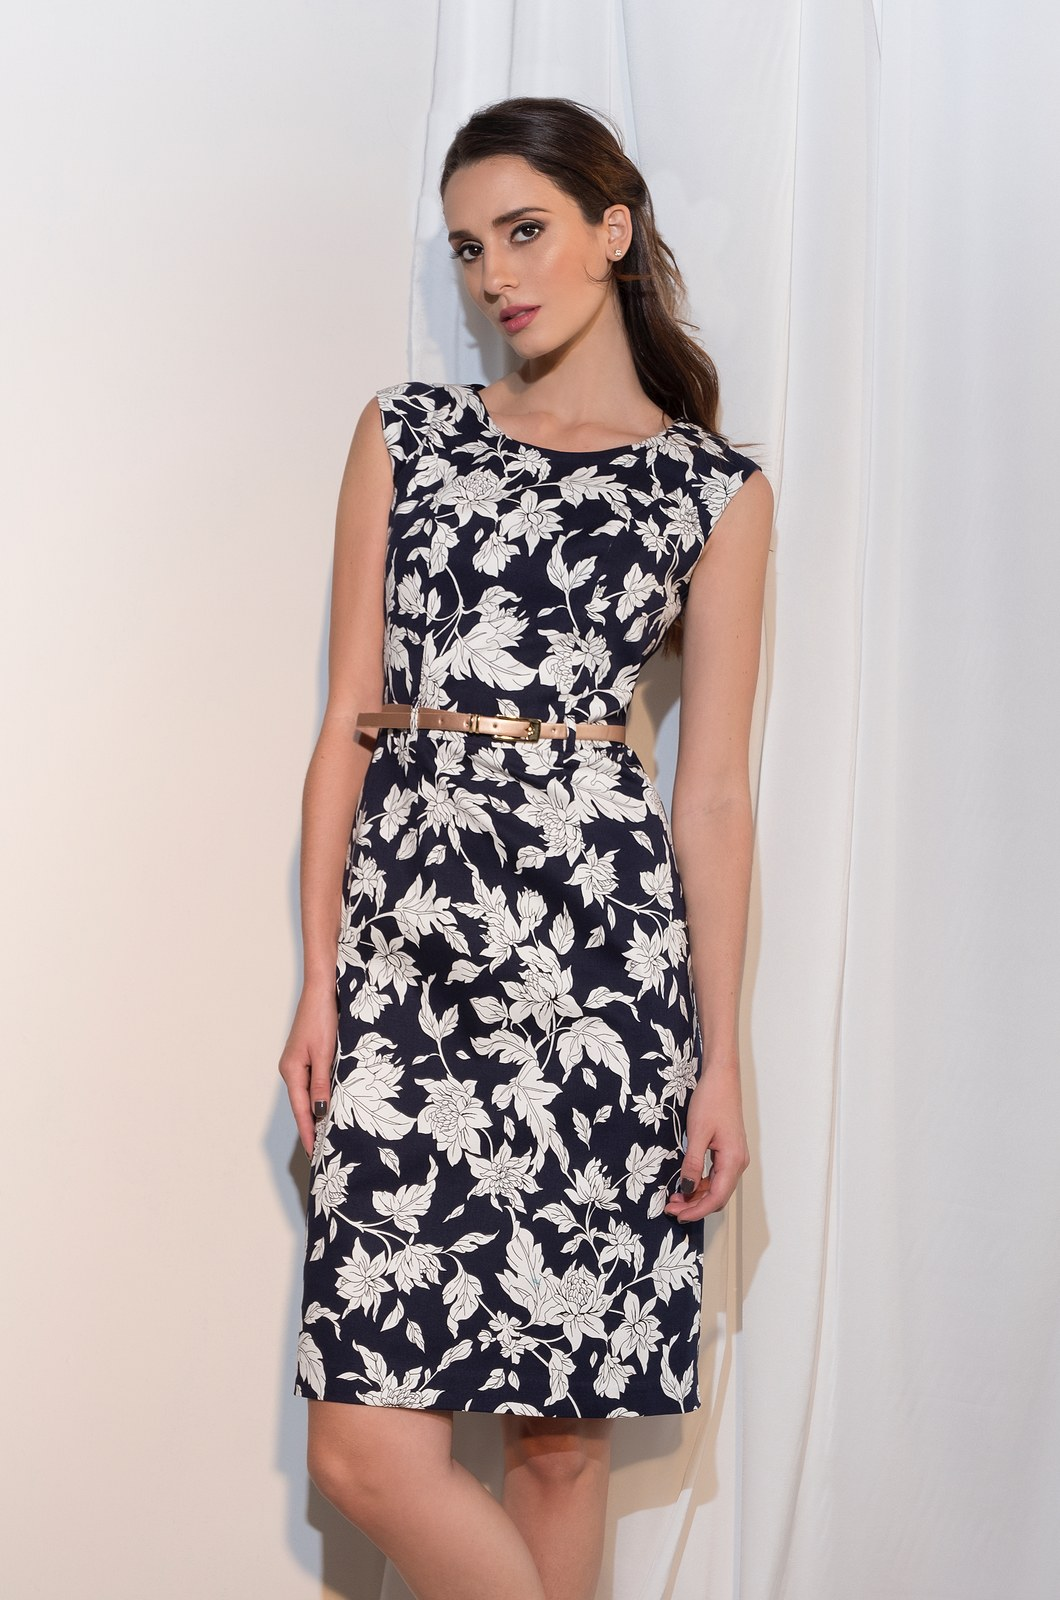 Vestido-talego-Ref-6928-9-Chazari